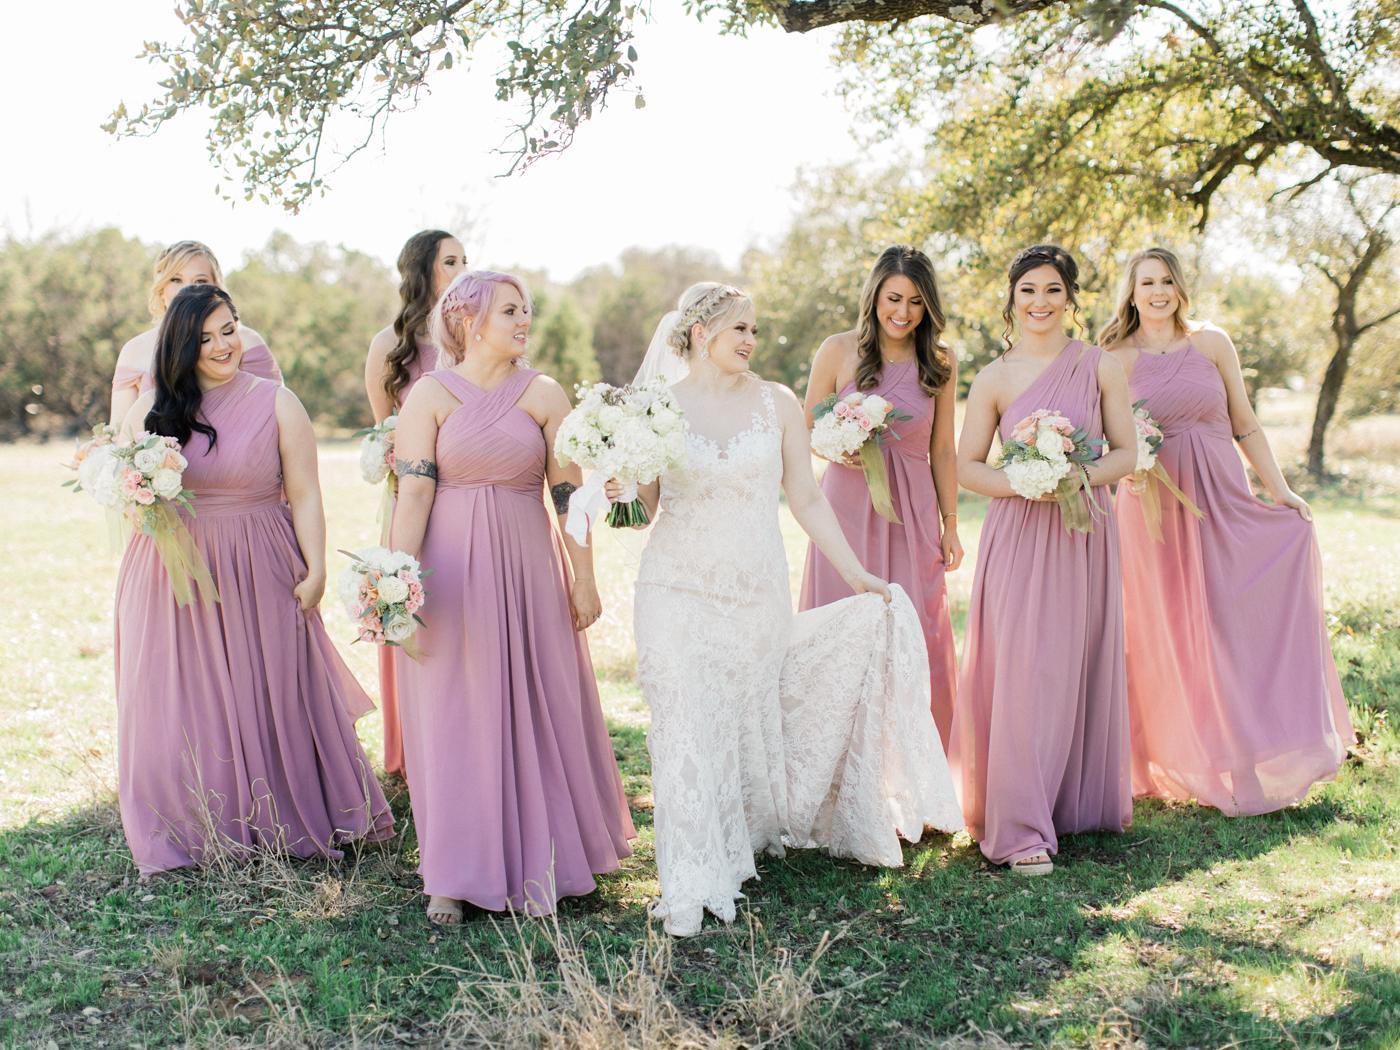 The Barn at Sparrow Creek Ranch Wedding Photos - Elegant Wedding Photographer